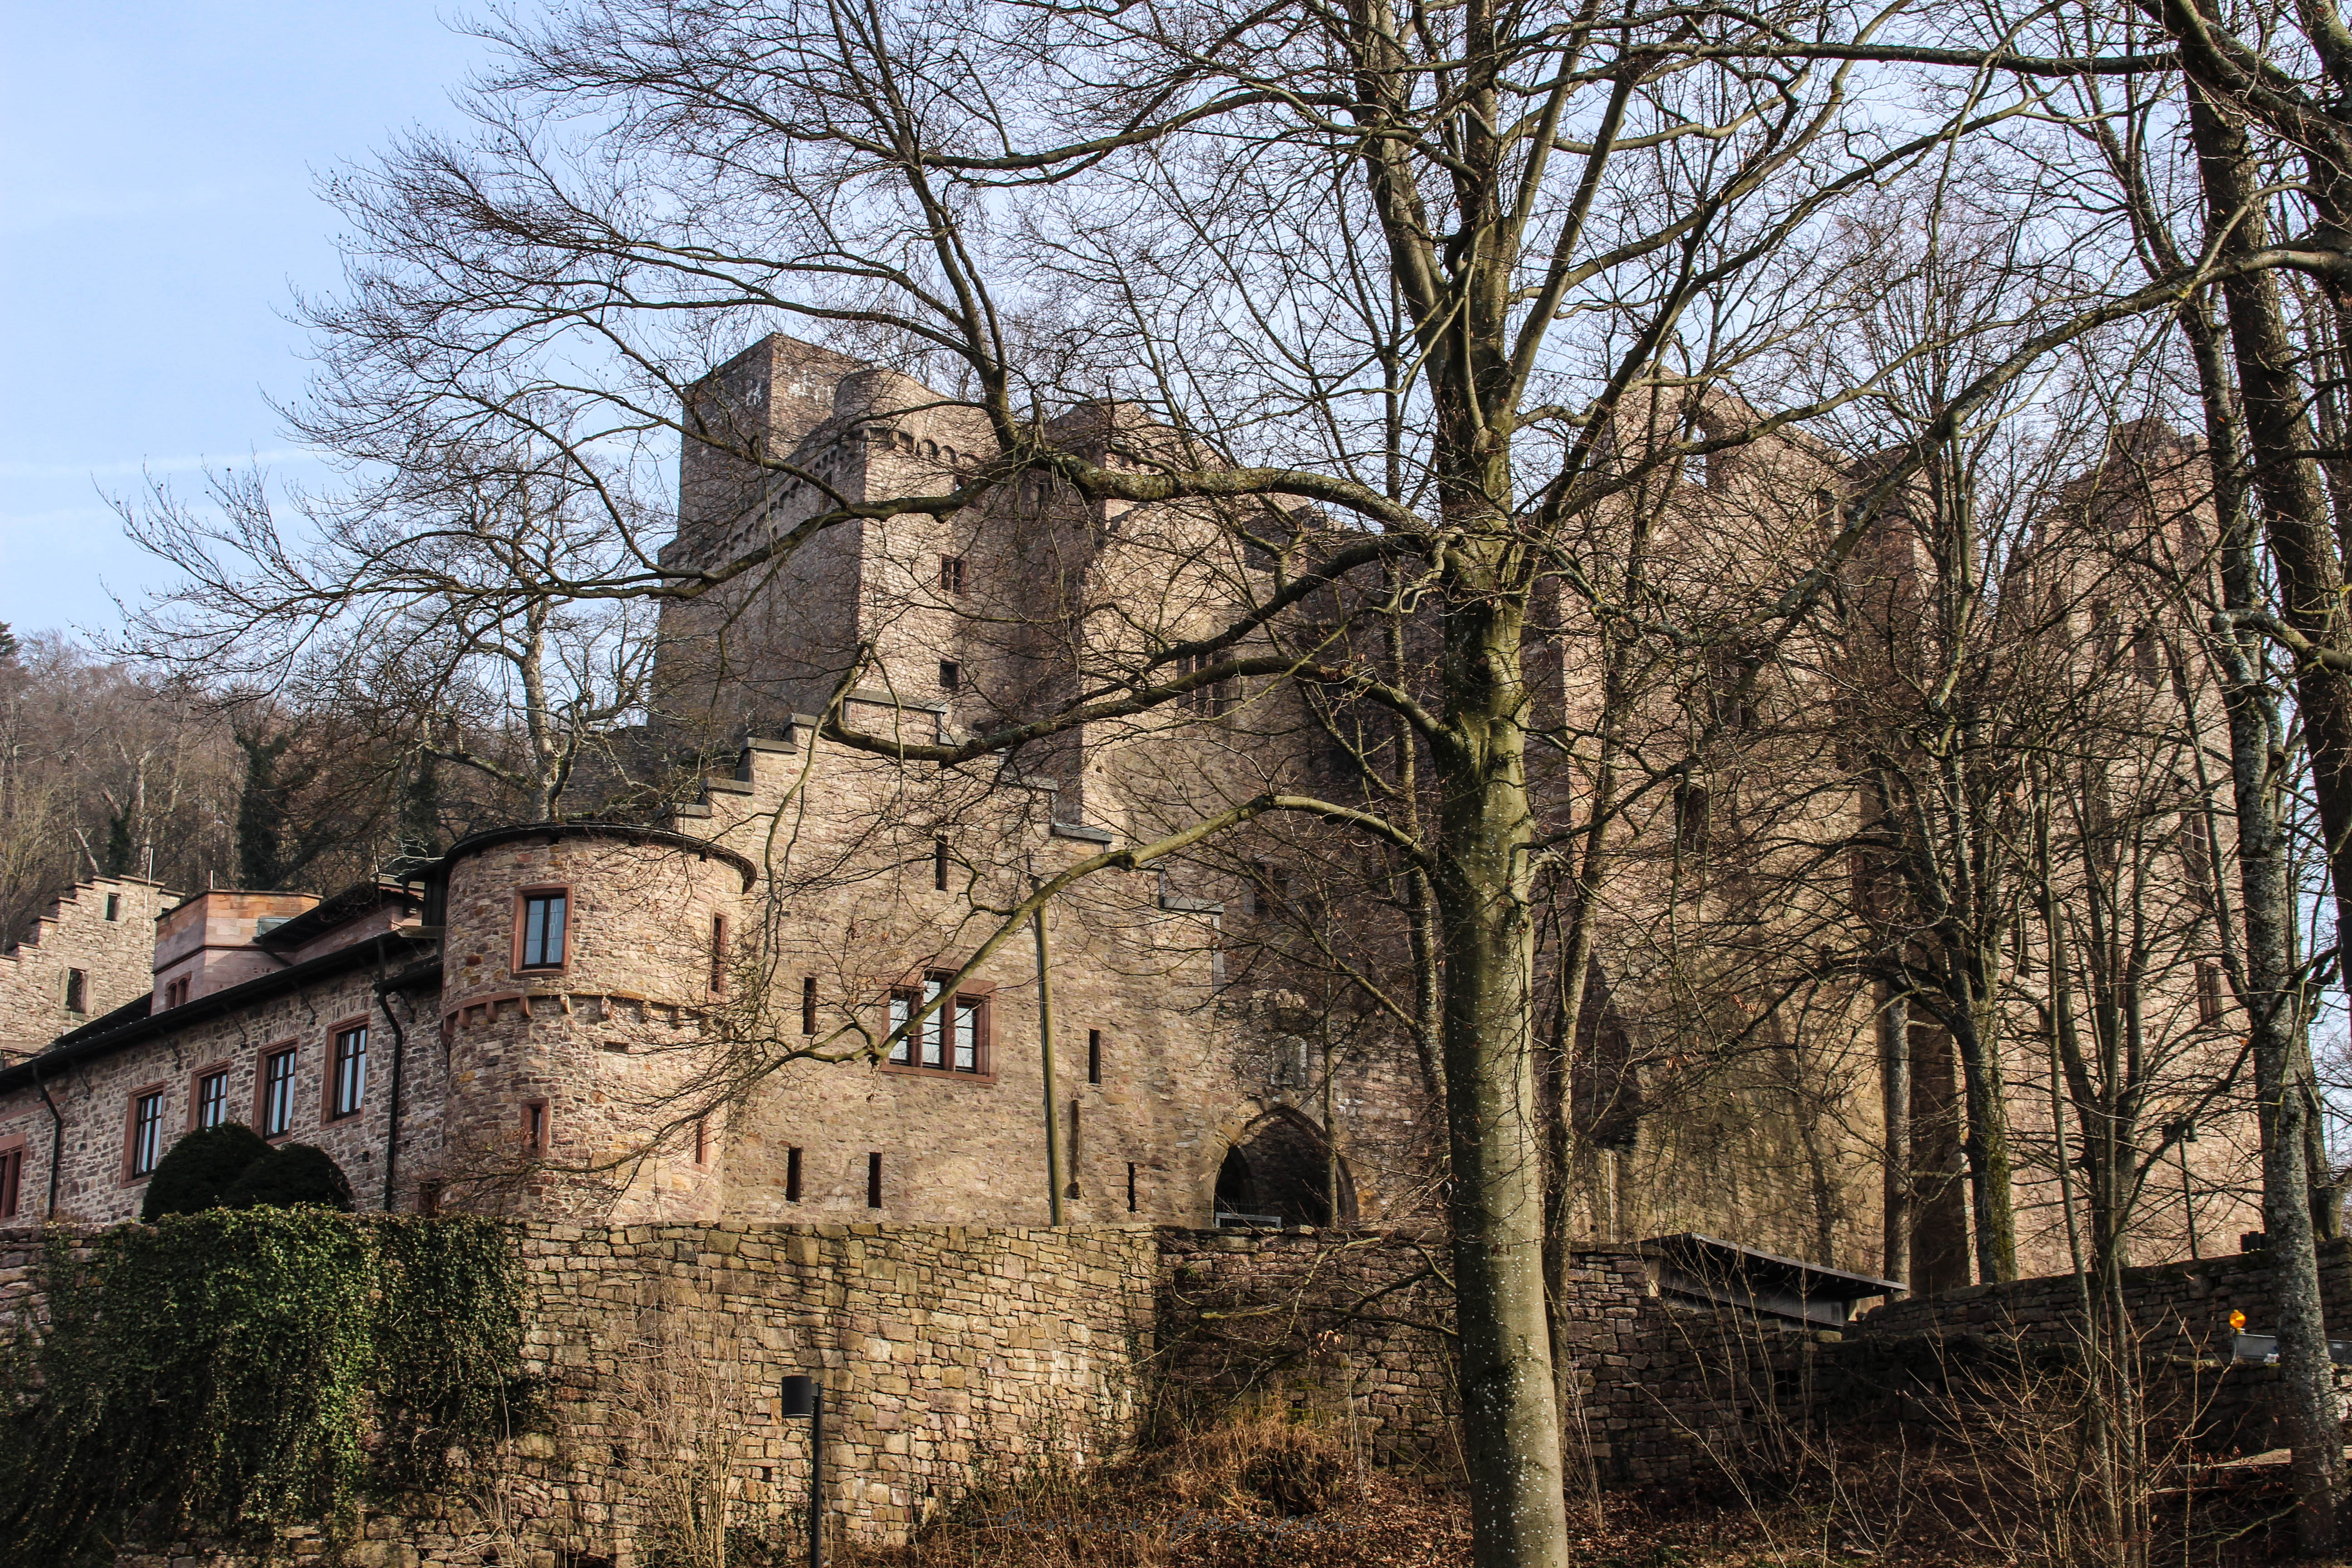 "Altes Schloss ""Old Castle"" in Black Forest, Germany. Built in 1102!"